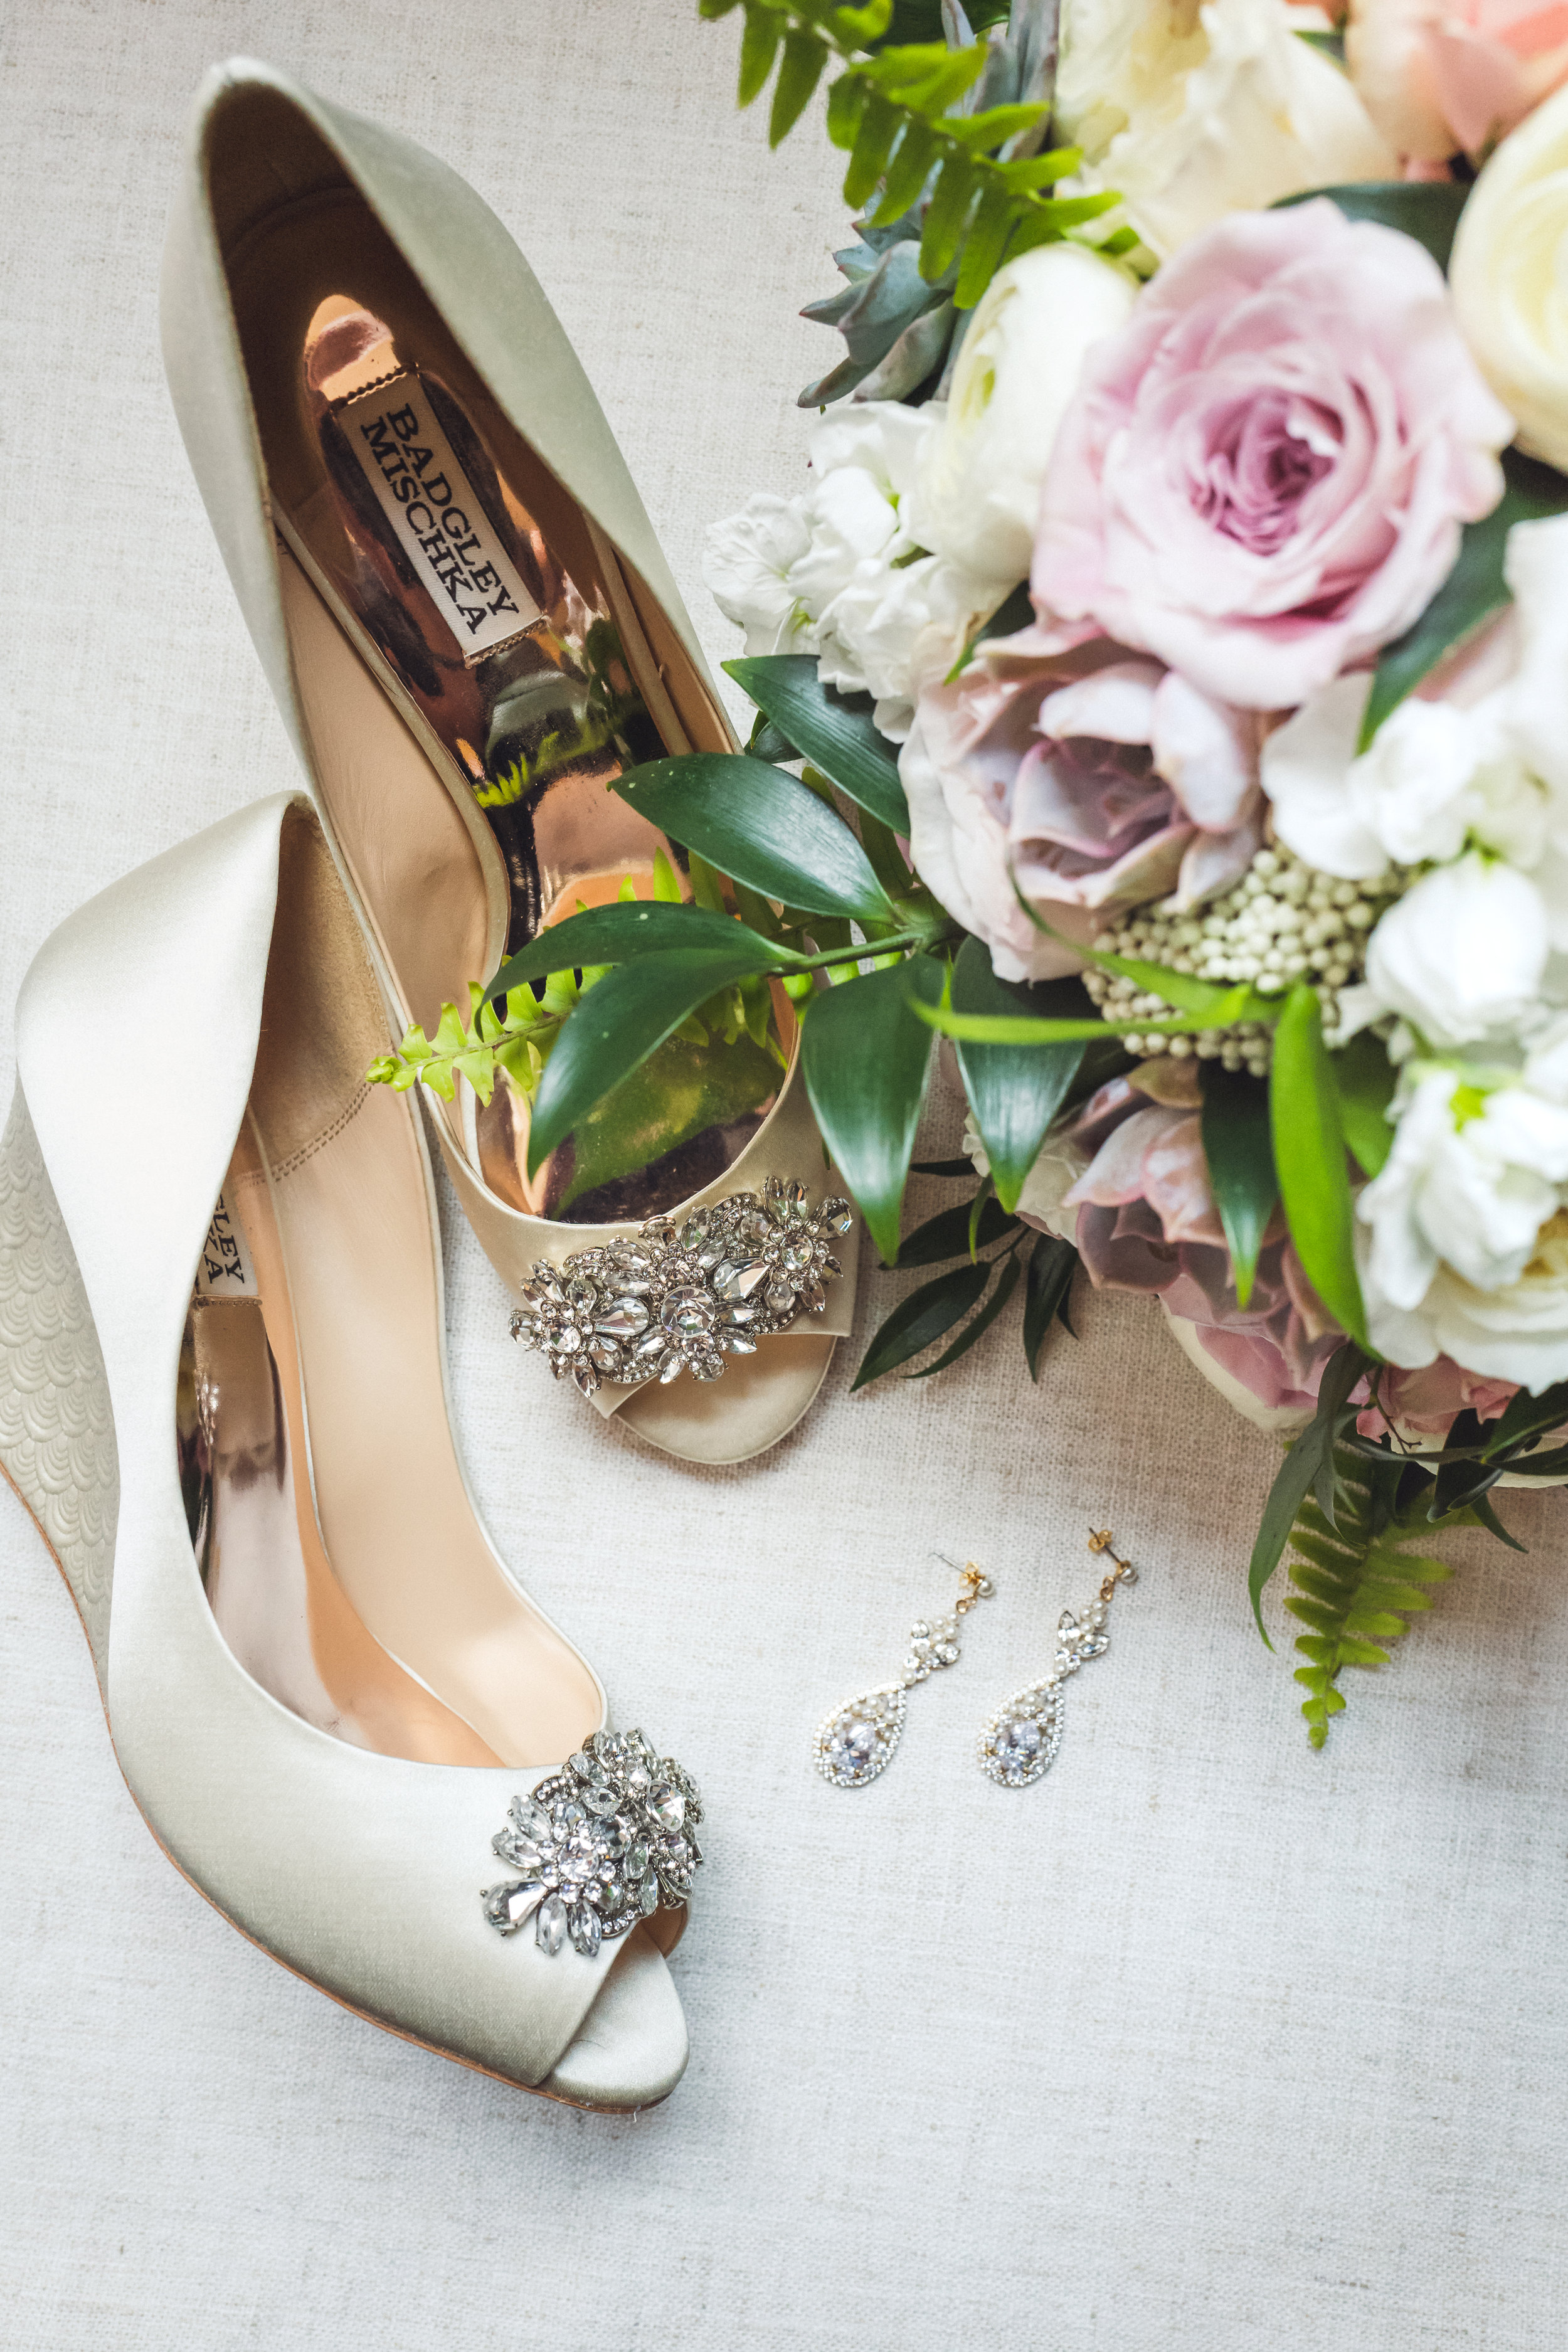 chicago-wedding-planner-getting ready- wedding-shoes